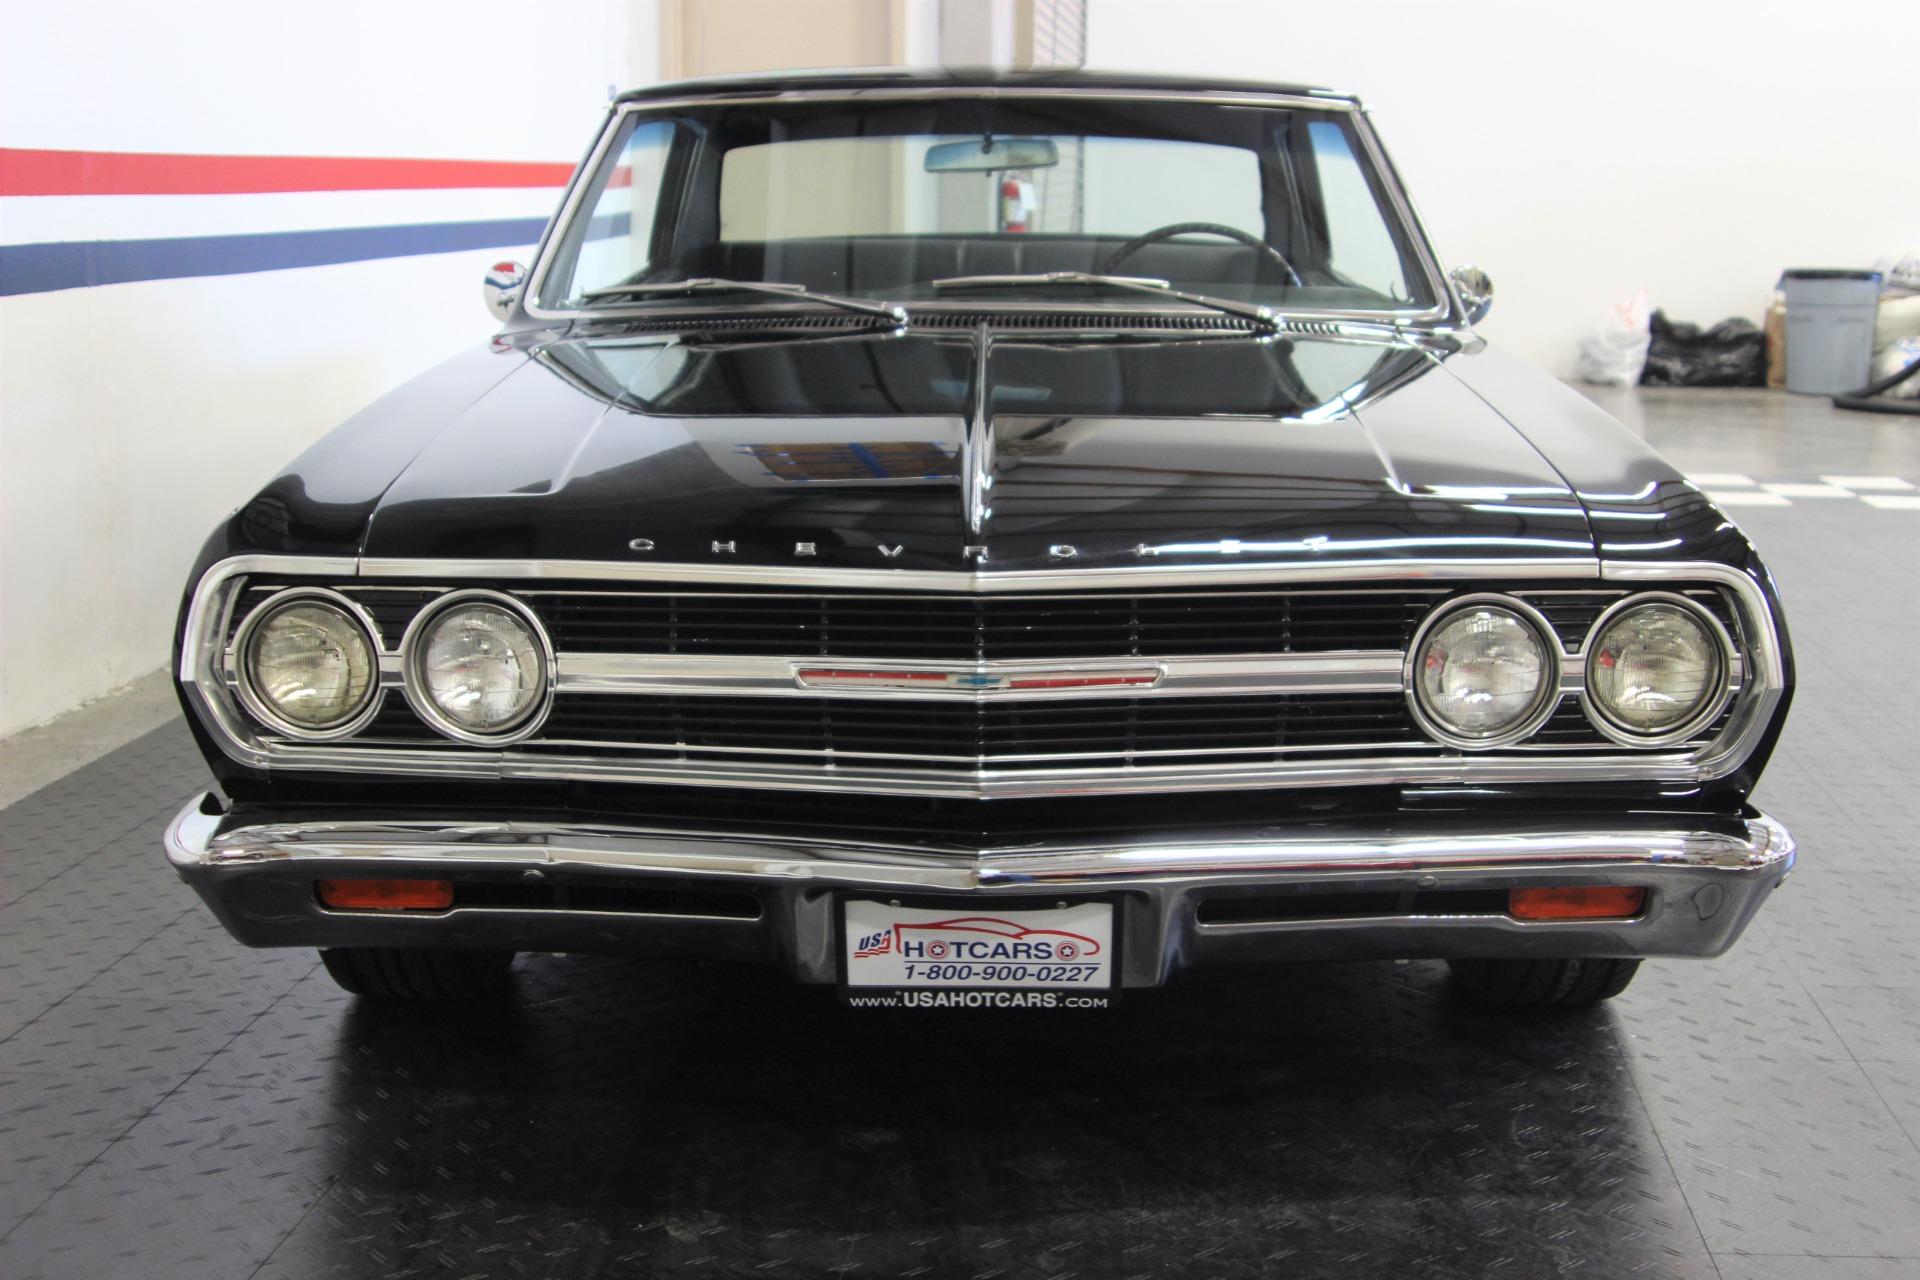 Used-1965-Chevrolet-Chevelle-Super-Sport